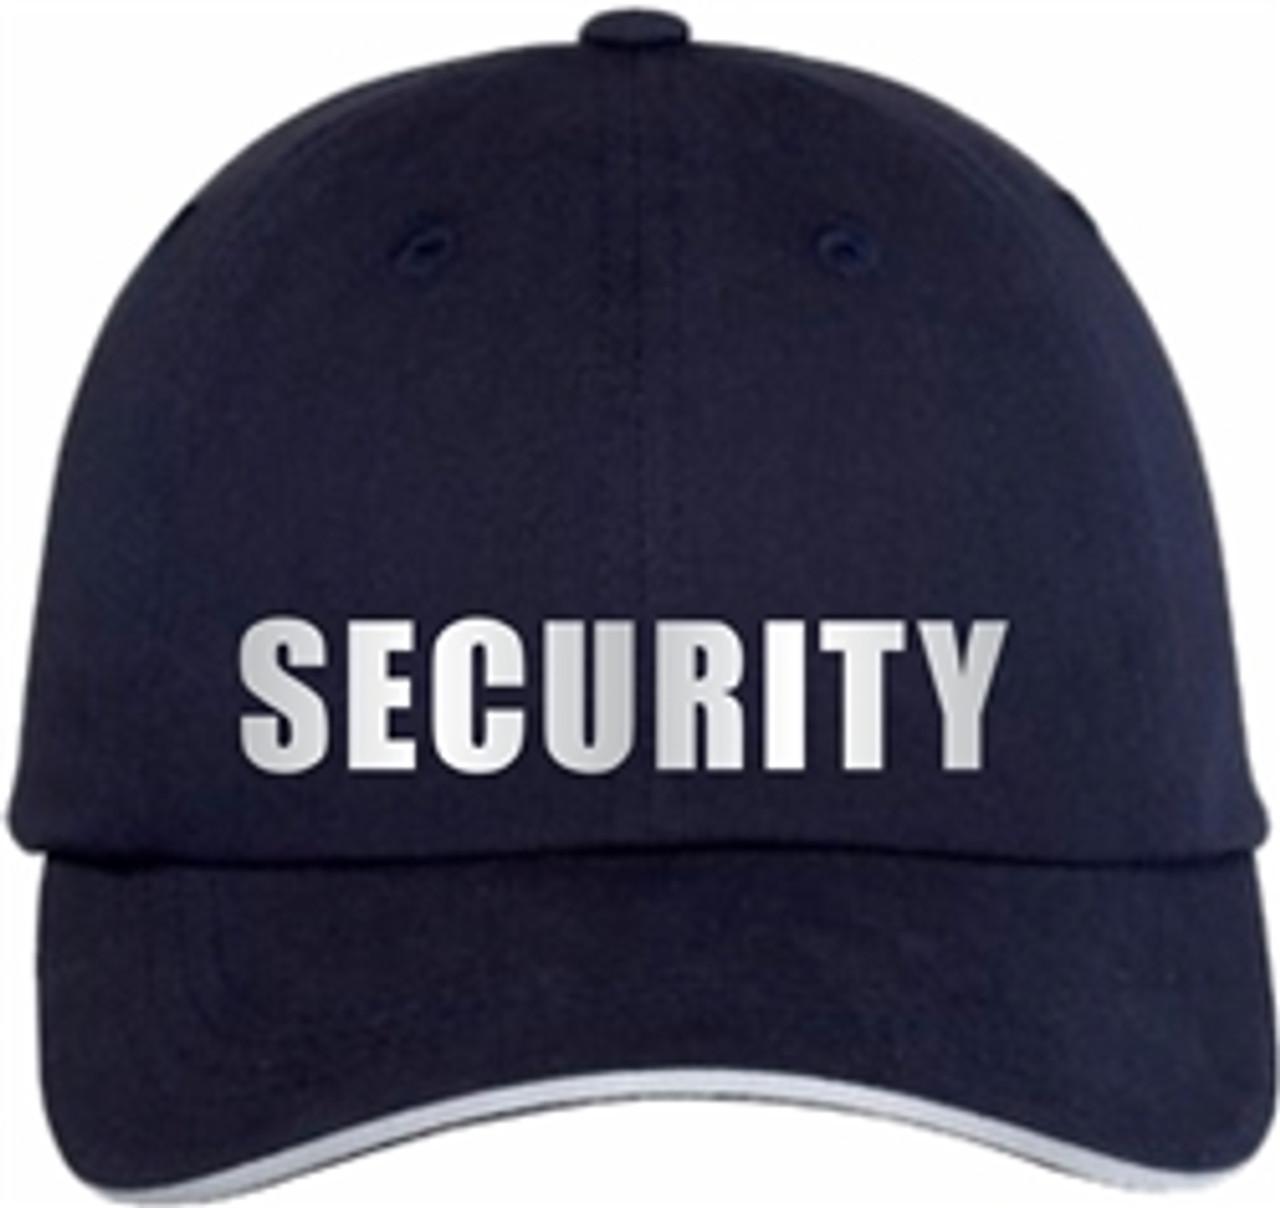 Navy Reflective Security Hat     Security Guard Reflective Sandwich Bill Cap   Security Guard Hat   Security Uniform Hat